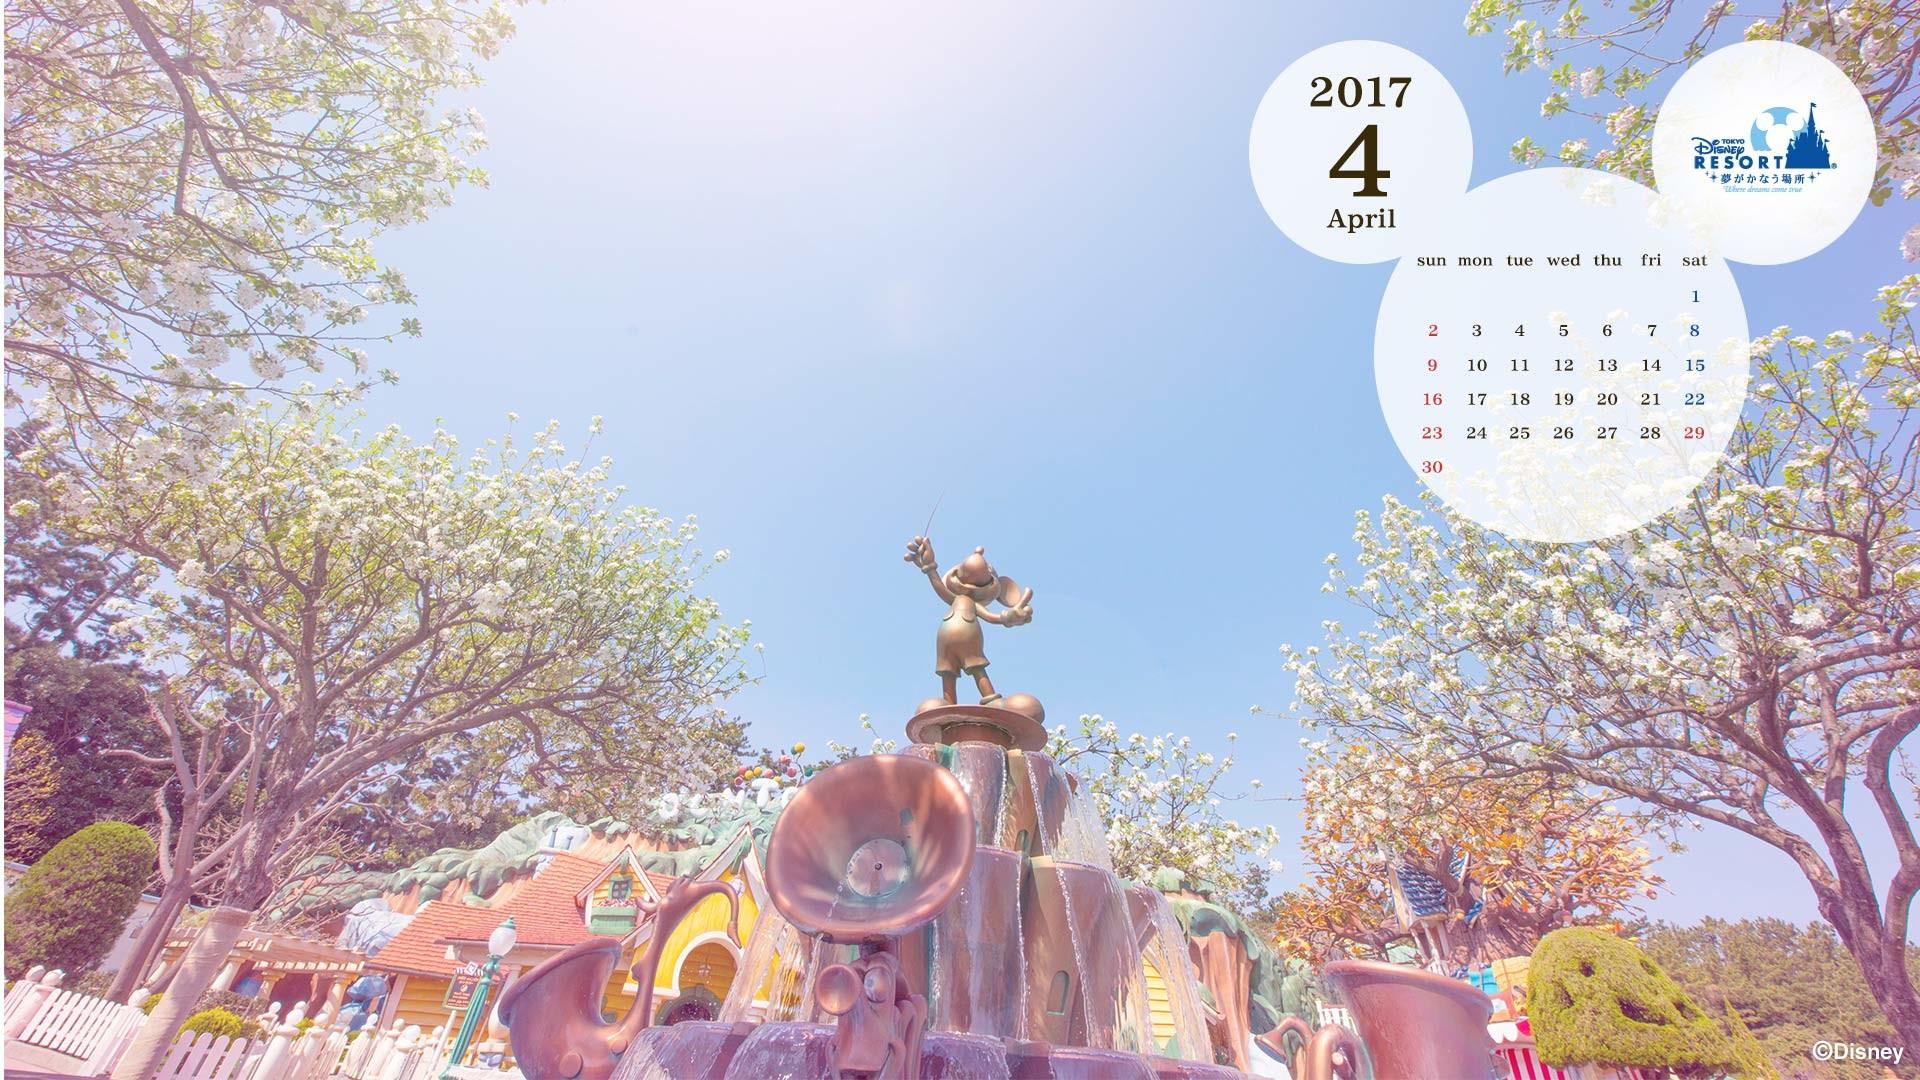 Tsum tsum wallpapers 60 images - Disney tablet wallpaper ...